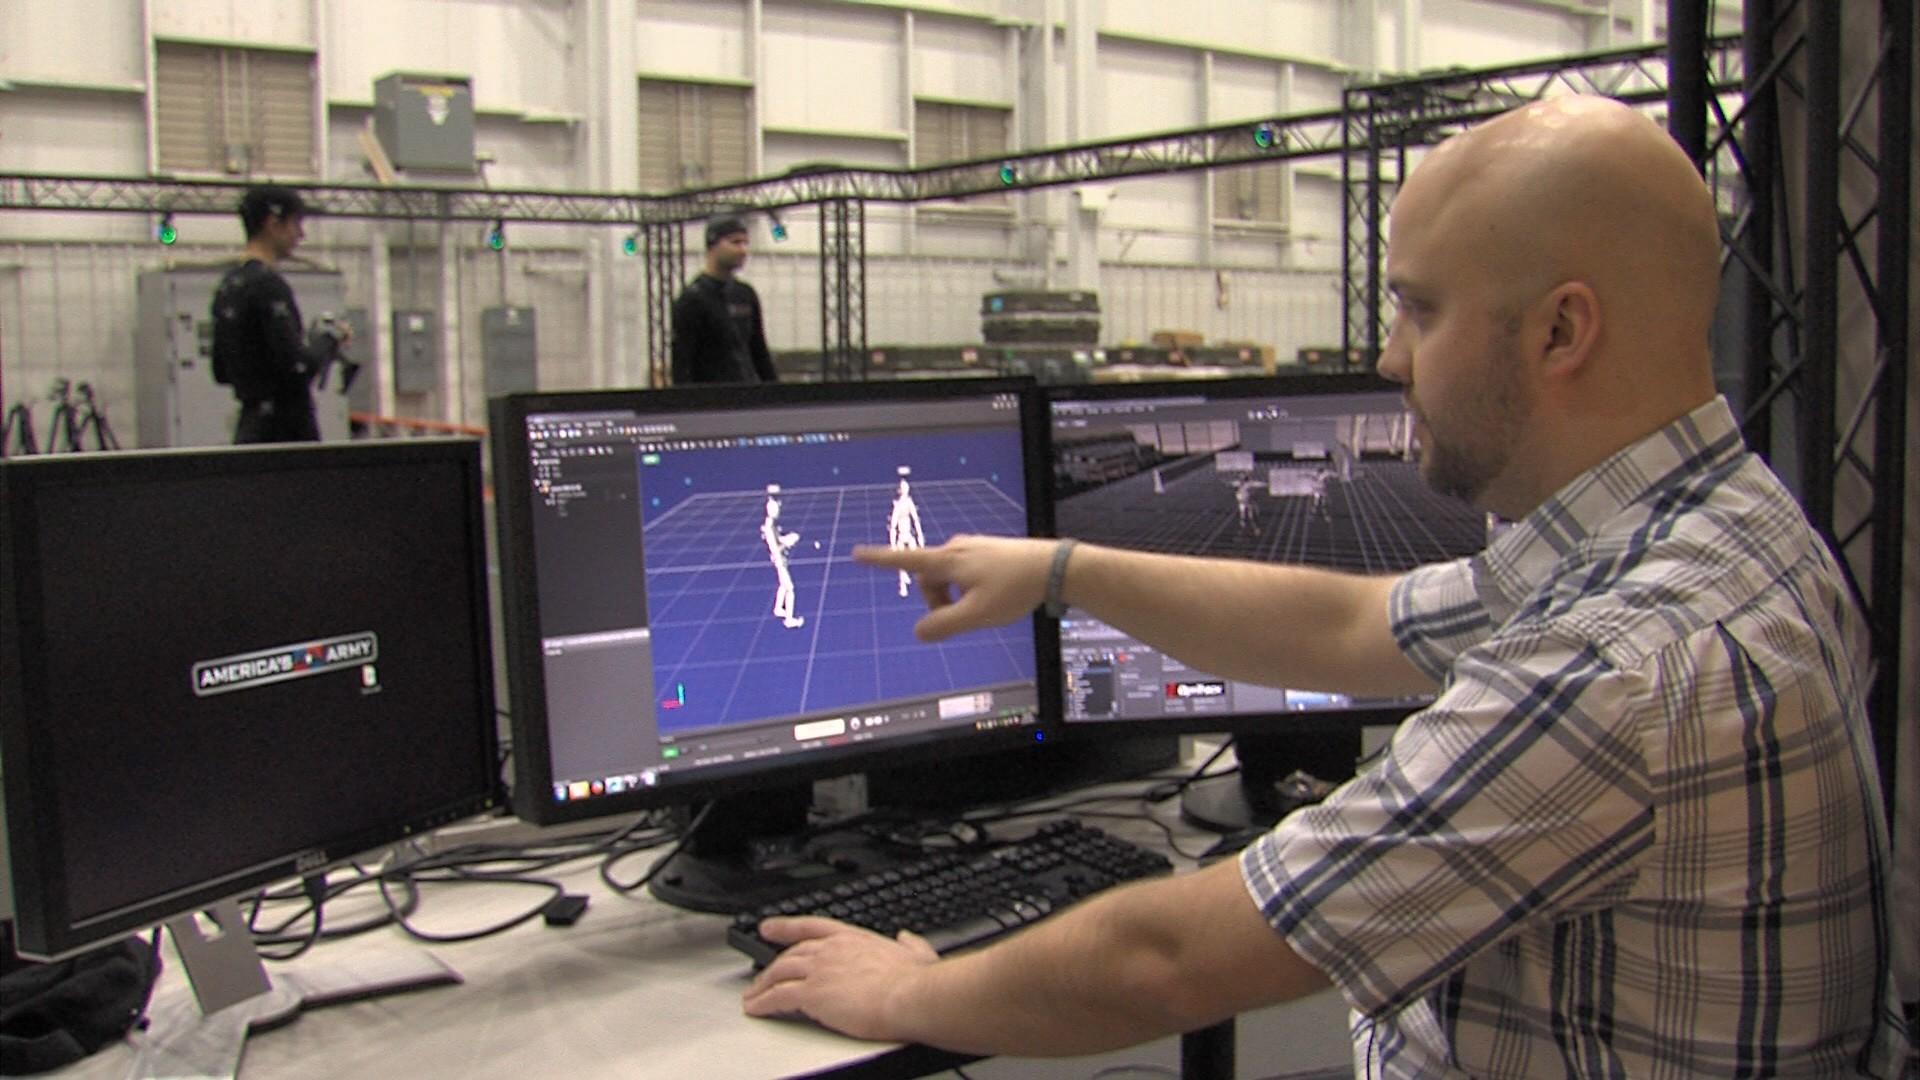 Army game studio creates virtual training environments for - Div games studio ...